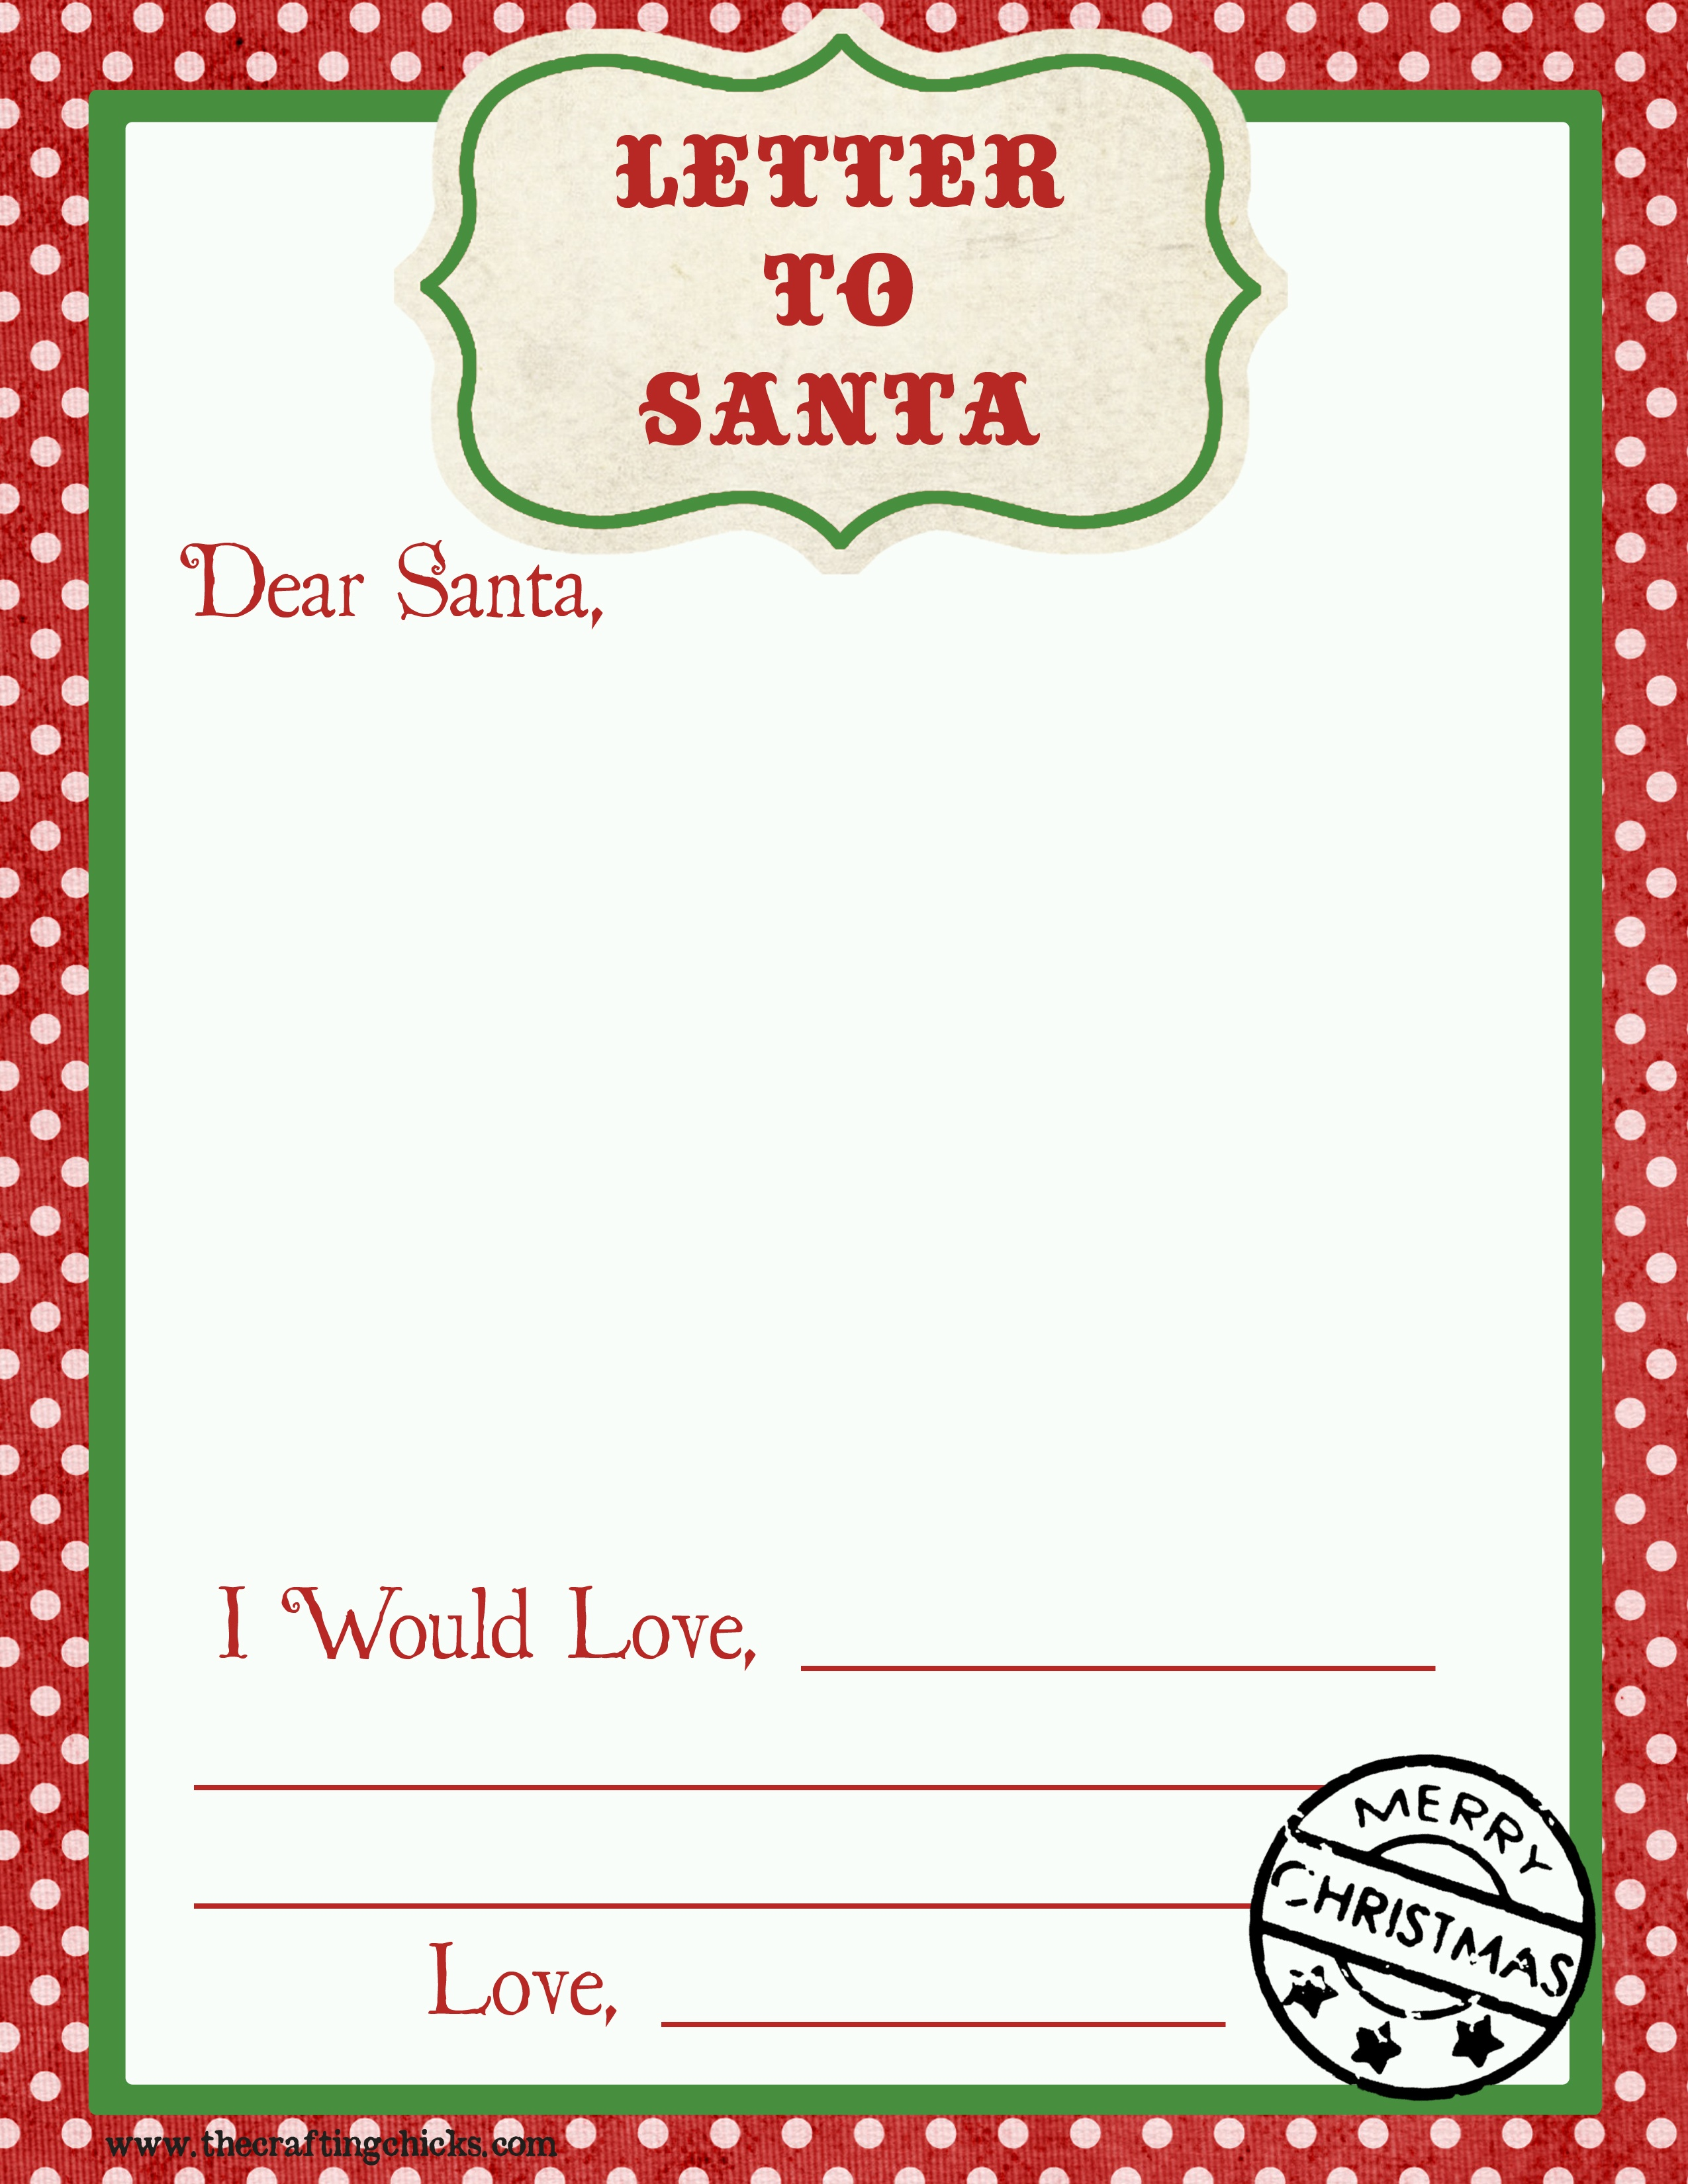 Letter To Santa Free Printable Download - Free Printable Dear Santa Stationary